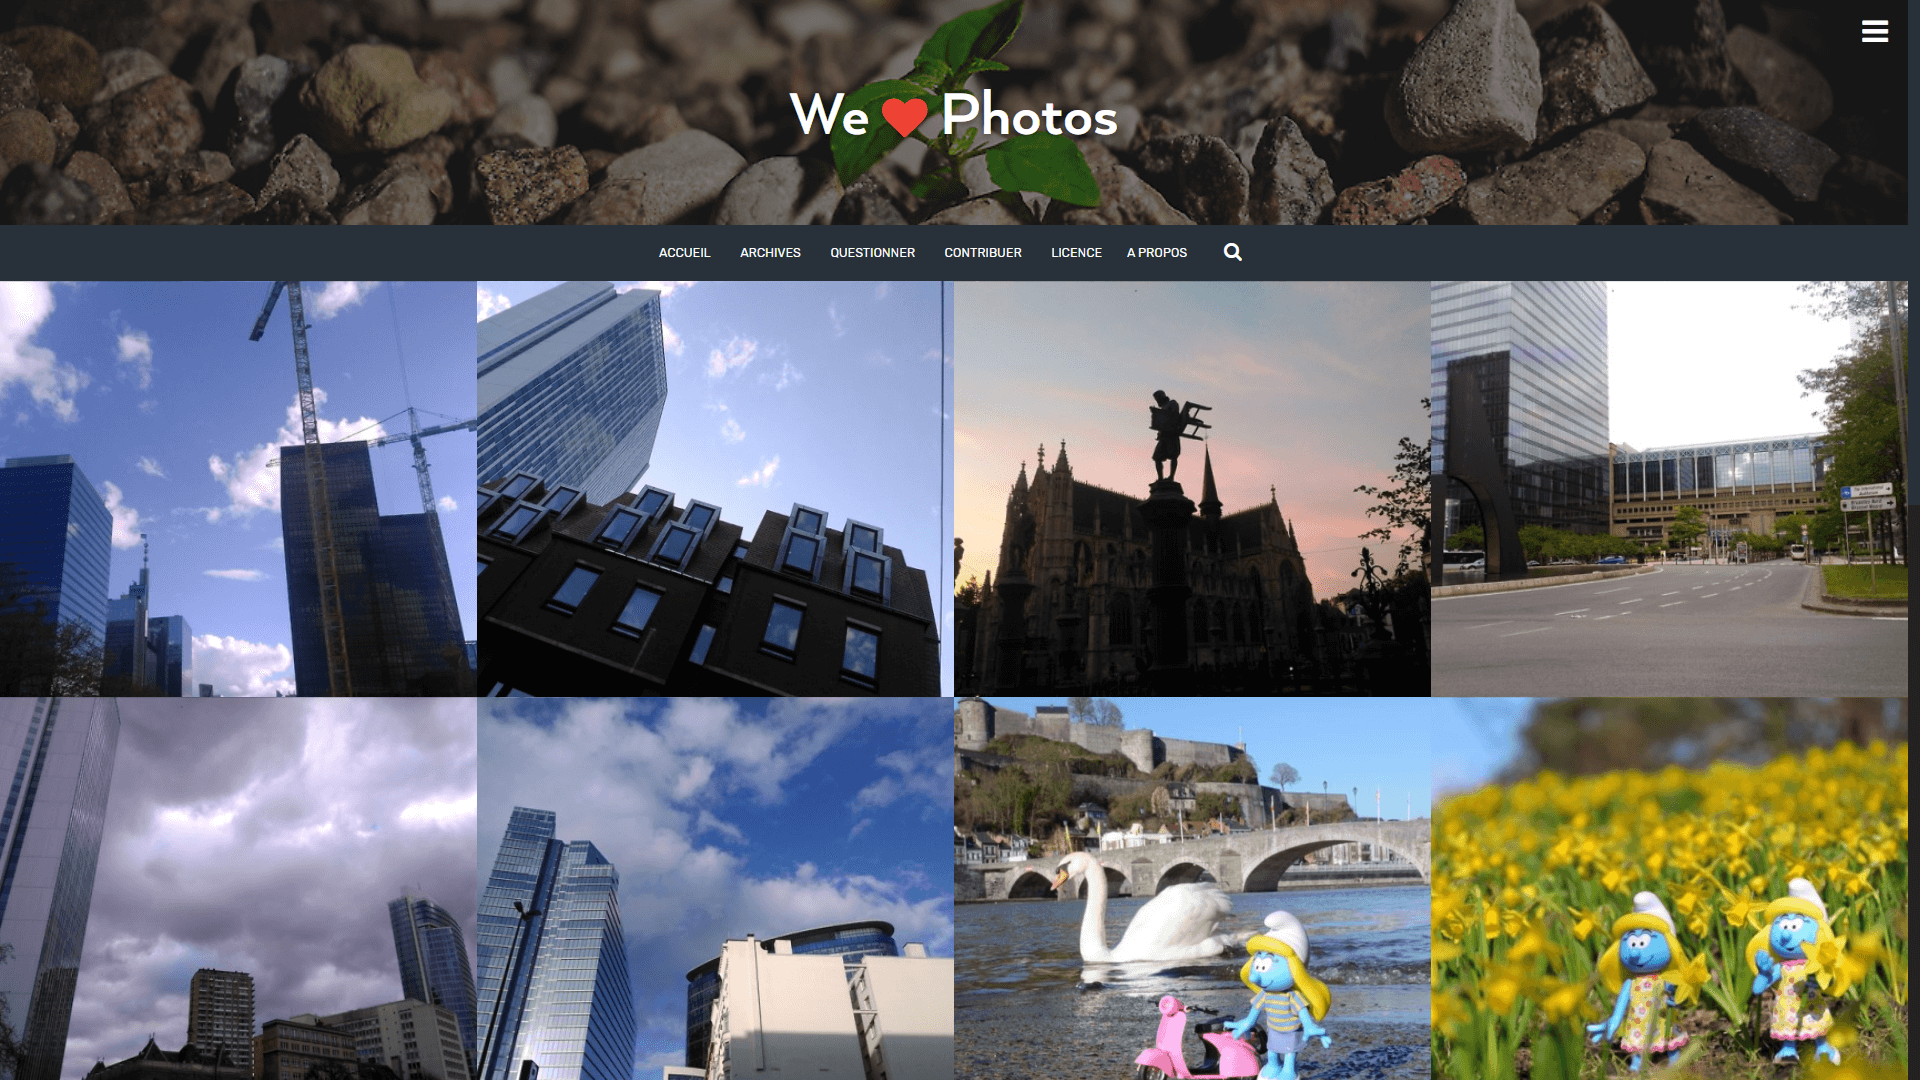 We Photos